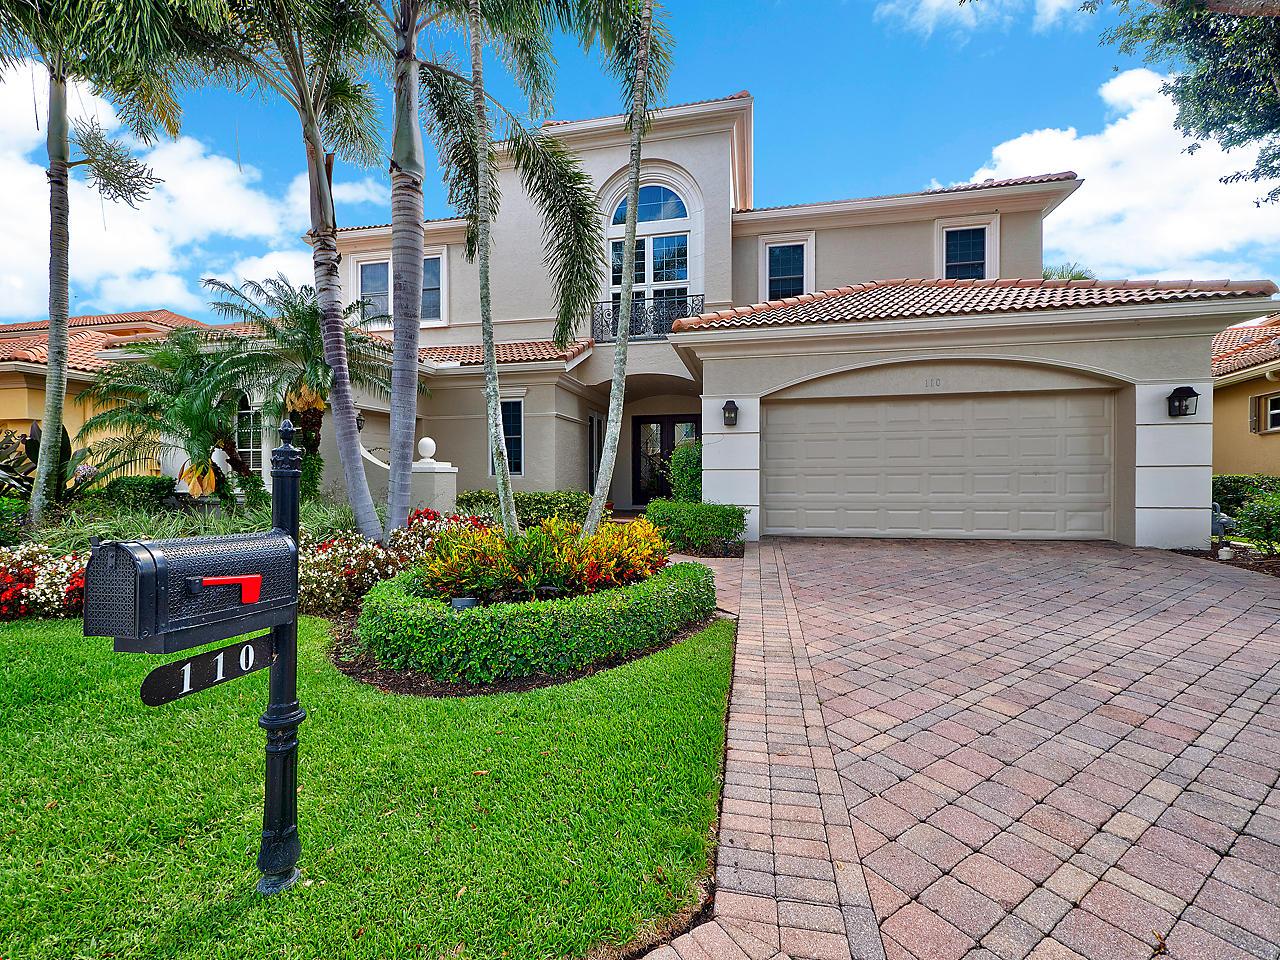 Photo of 110 Sunesta Cove Drive, Palm Beach Gardens, FL 33418